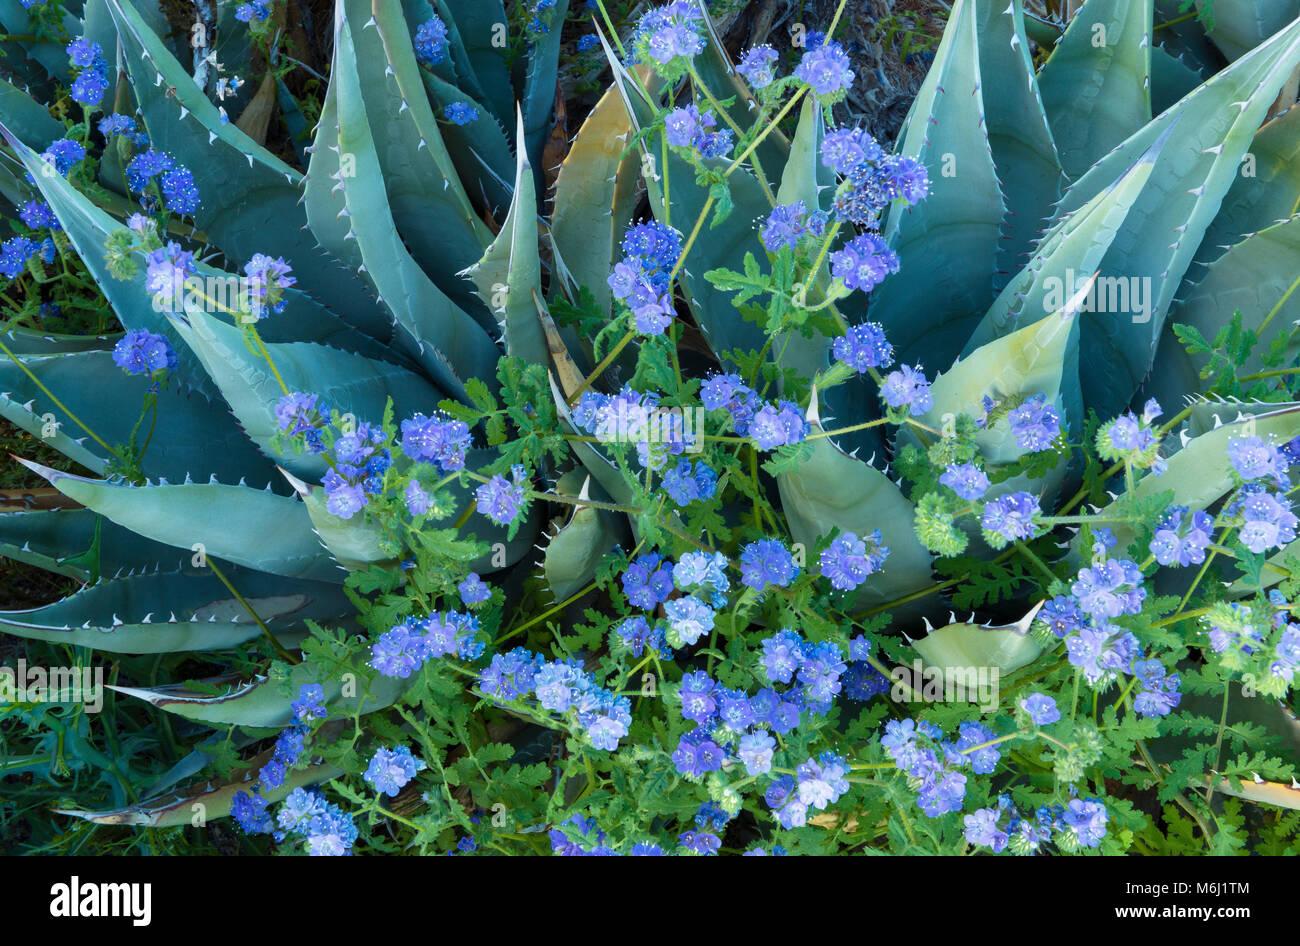 Agave, Blau Phacelia, Glorietta Canyon, Anza-Borrego Desert Stockbild